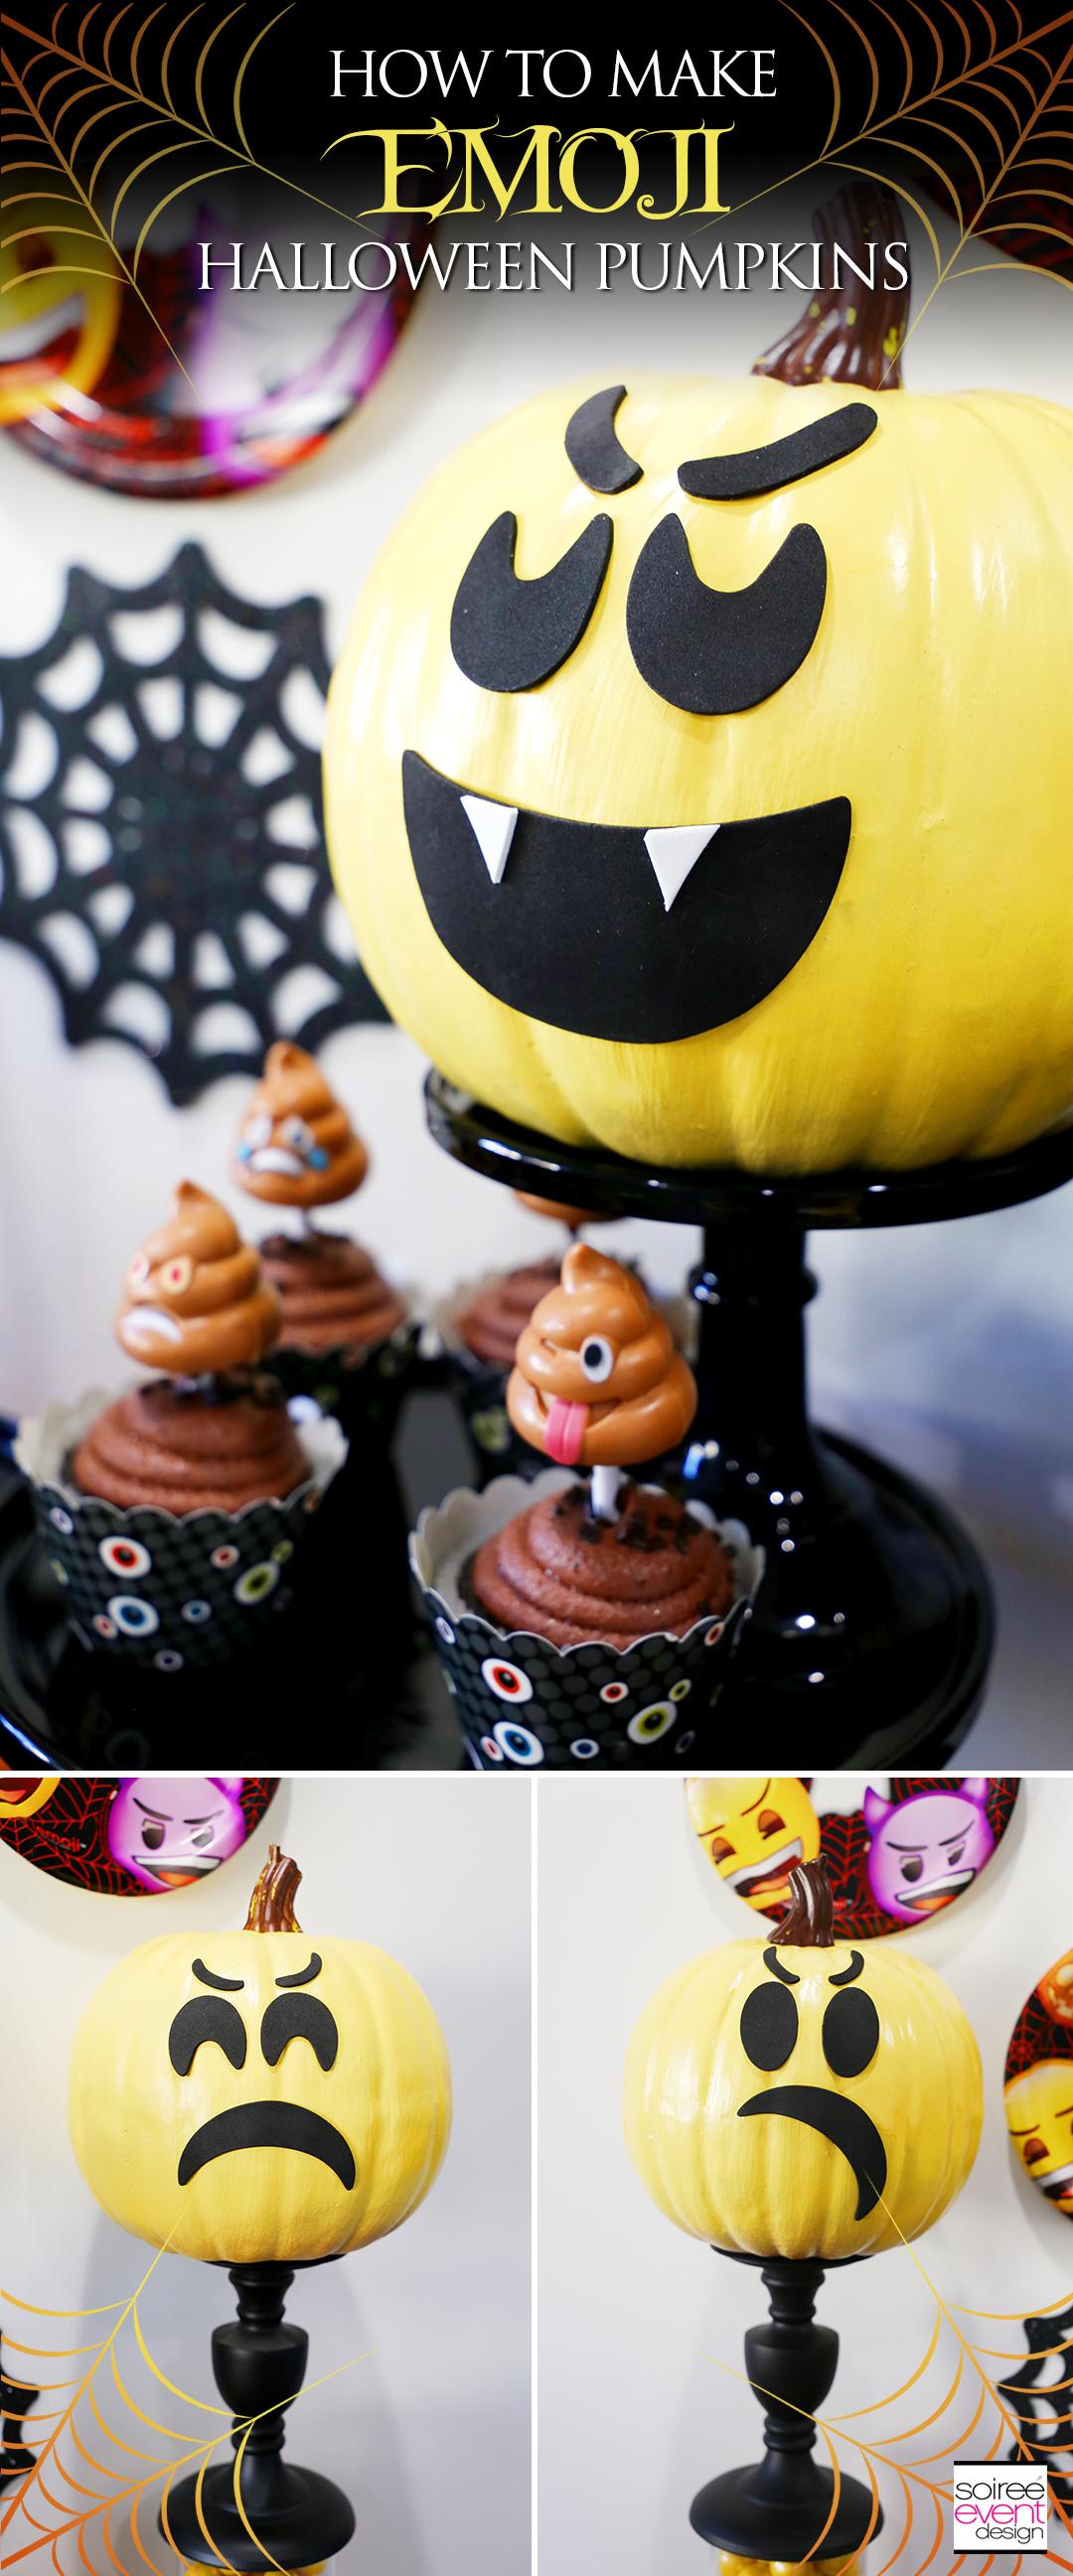 Emoji Halloween Party Ideas - DIY Emoji Pumpkins